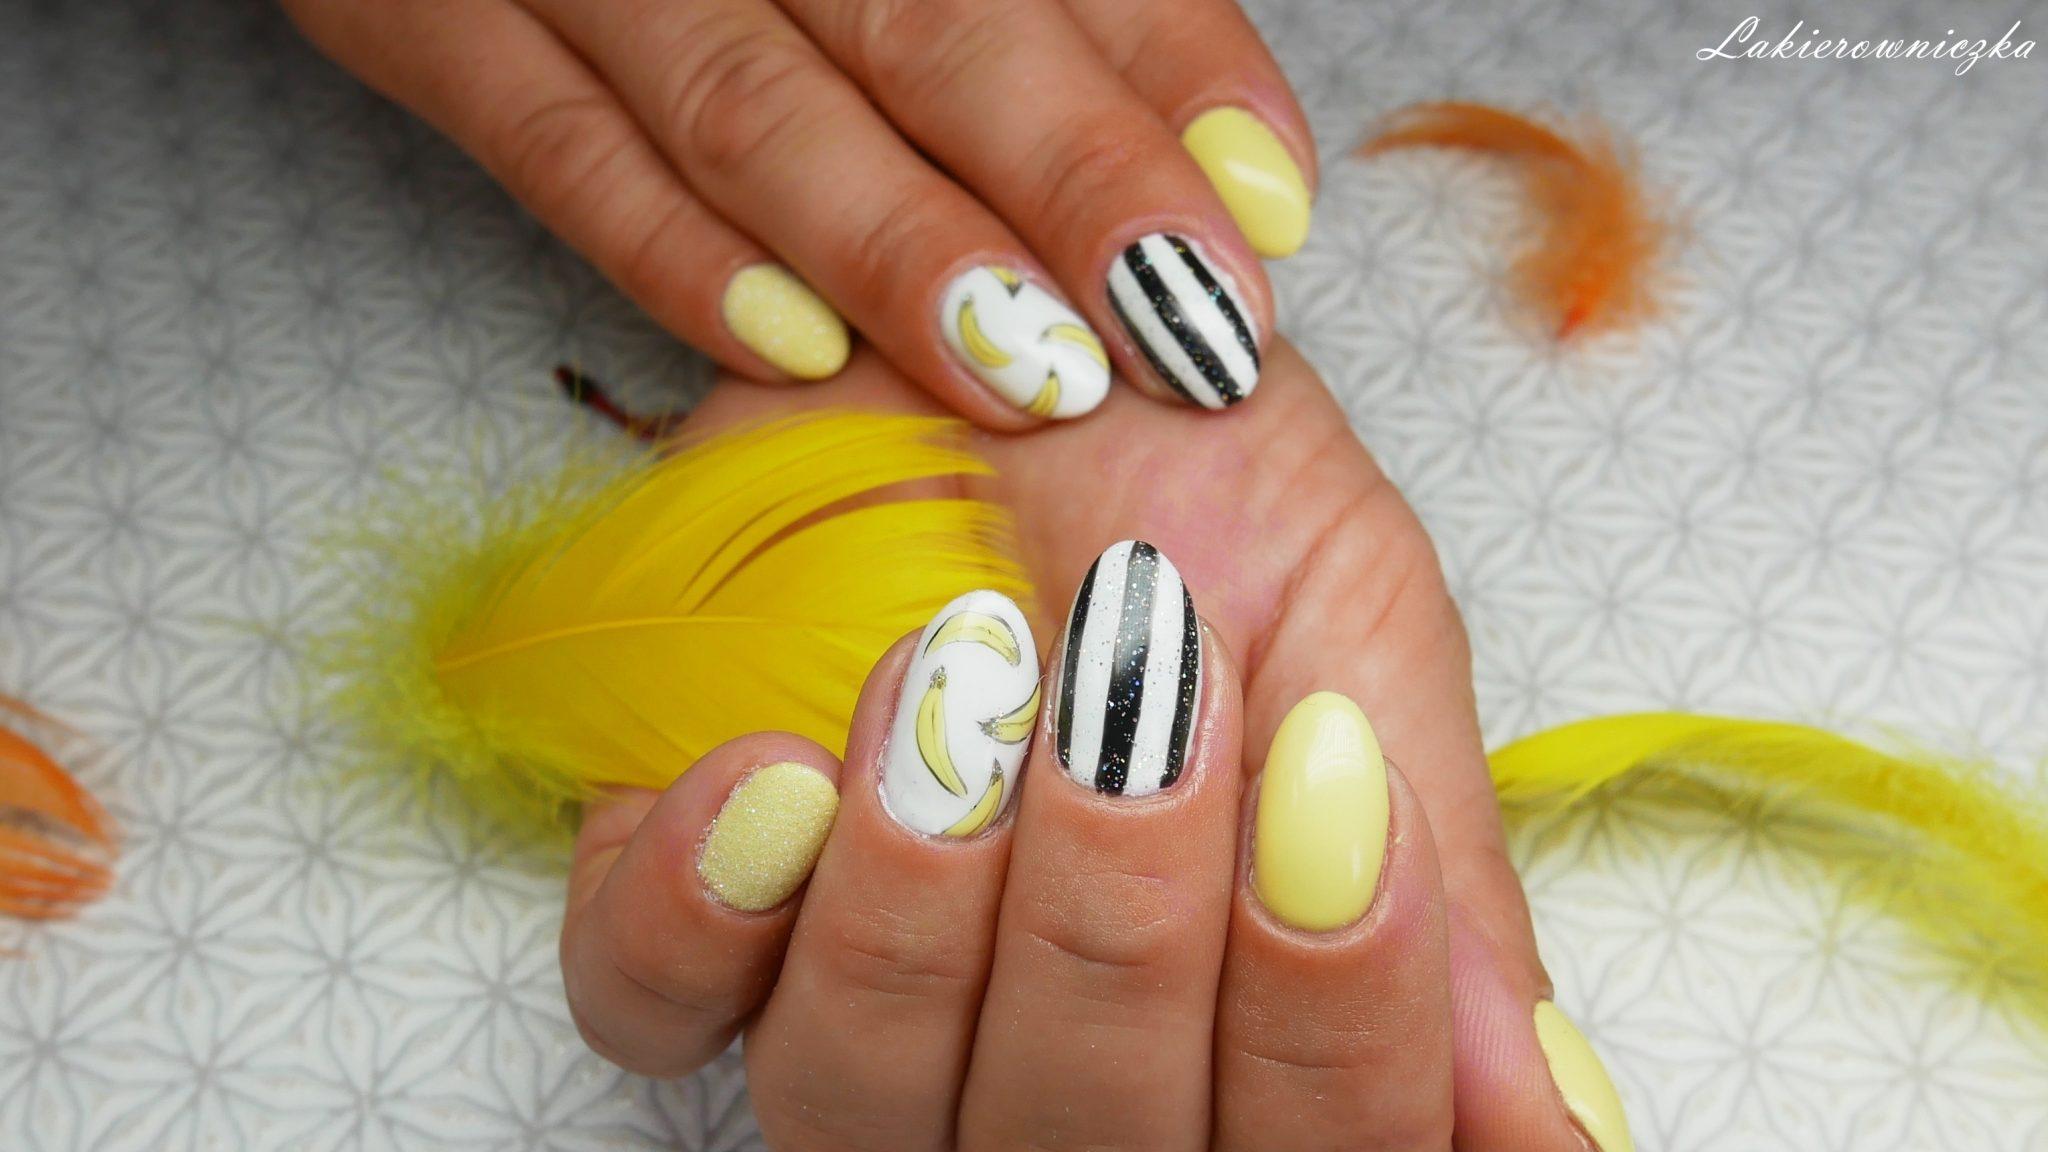 bananowa-hybryda-Provocater-094-vanilla-icecream-na-paznokciach-hyrbydy-bialo-czarne-paski-paznokcie-efekt-syrenki-syrenka-banany-Lakierowniczka